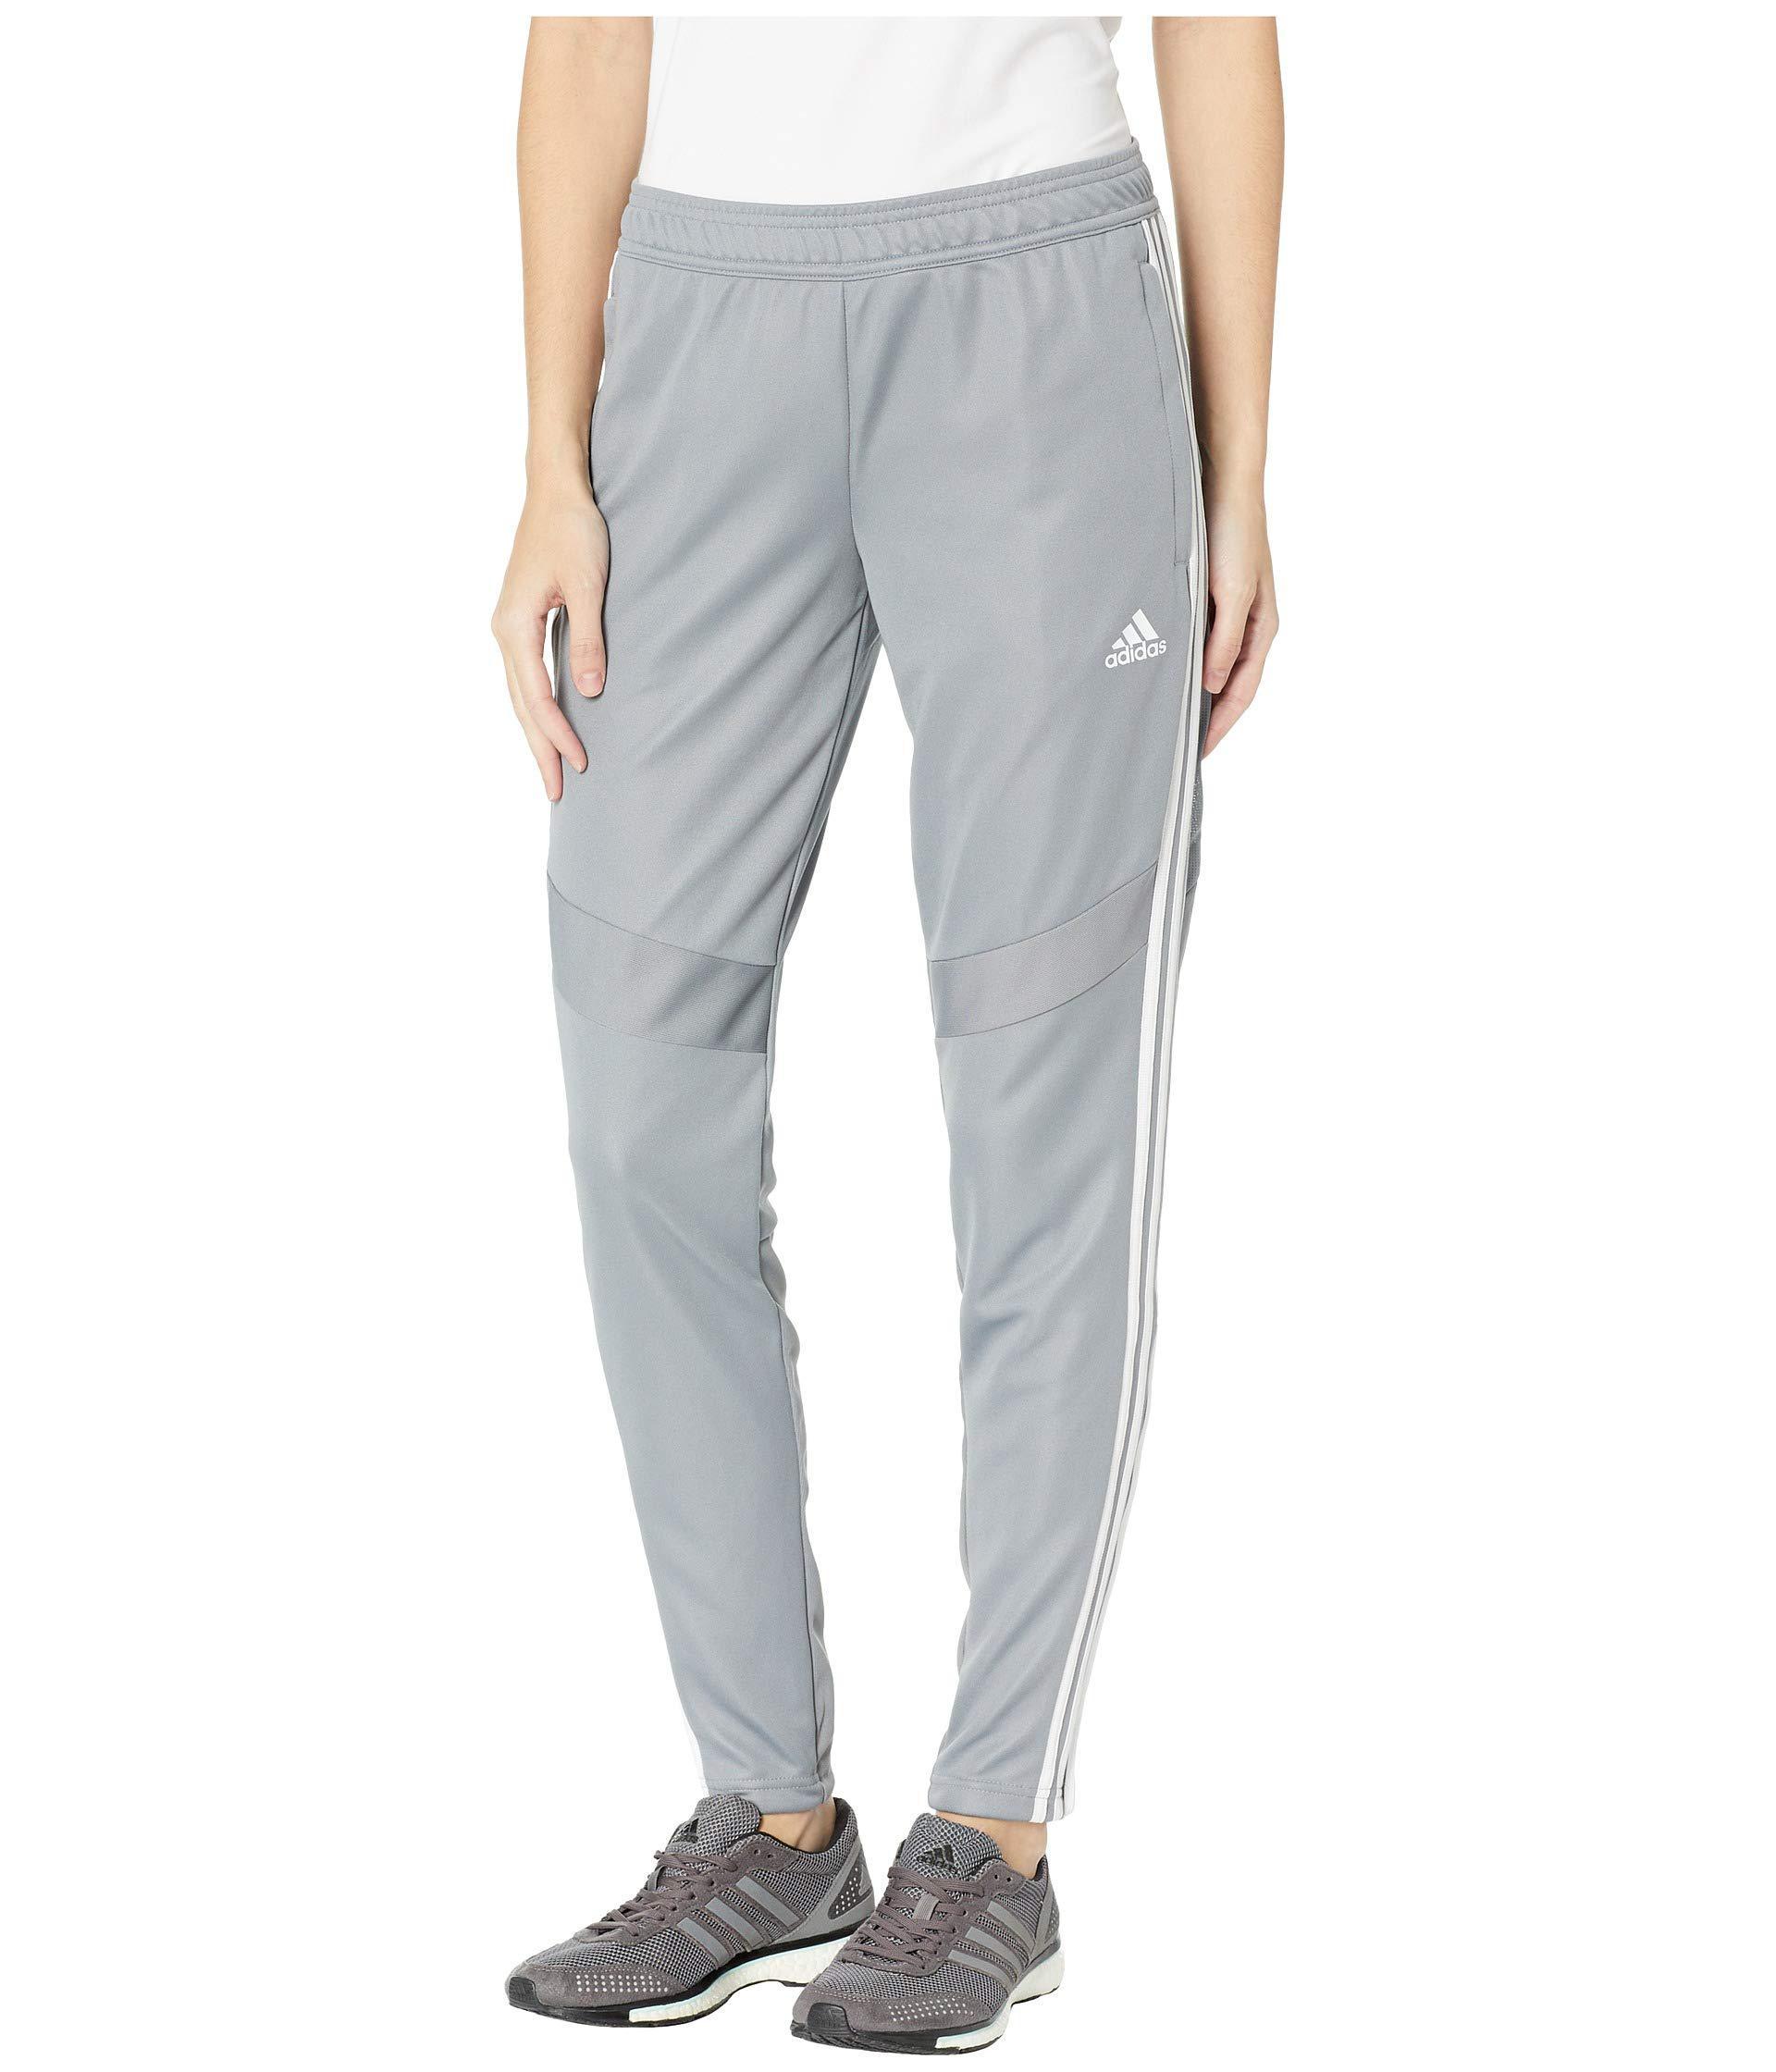 Adidas Gray Tiro '19 Pants (legend Inkclear Mint) Women's Casual Pants